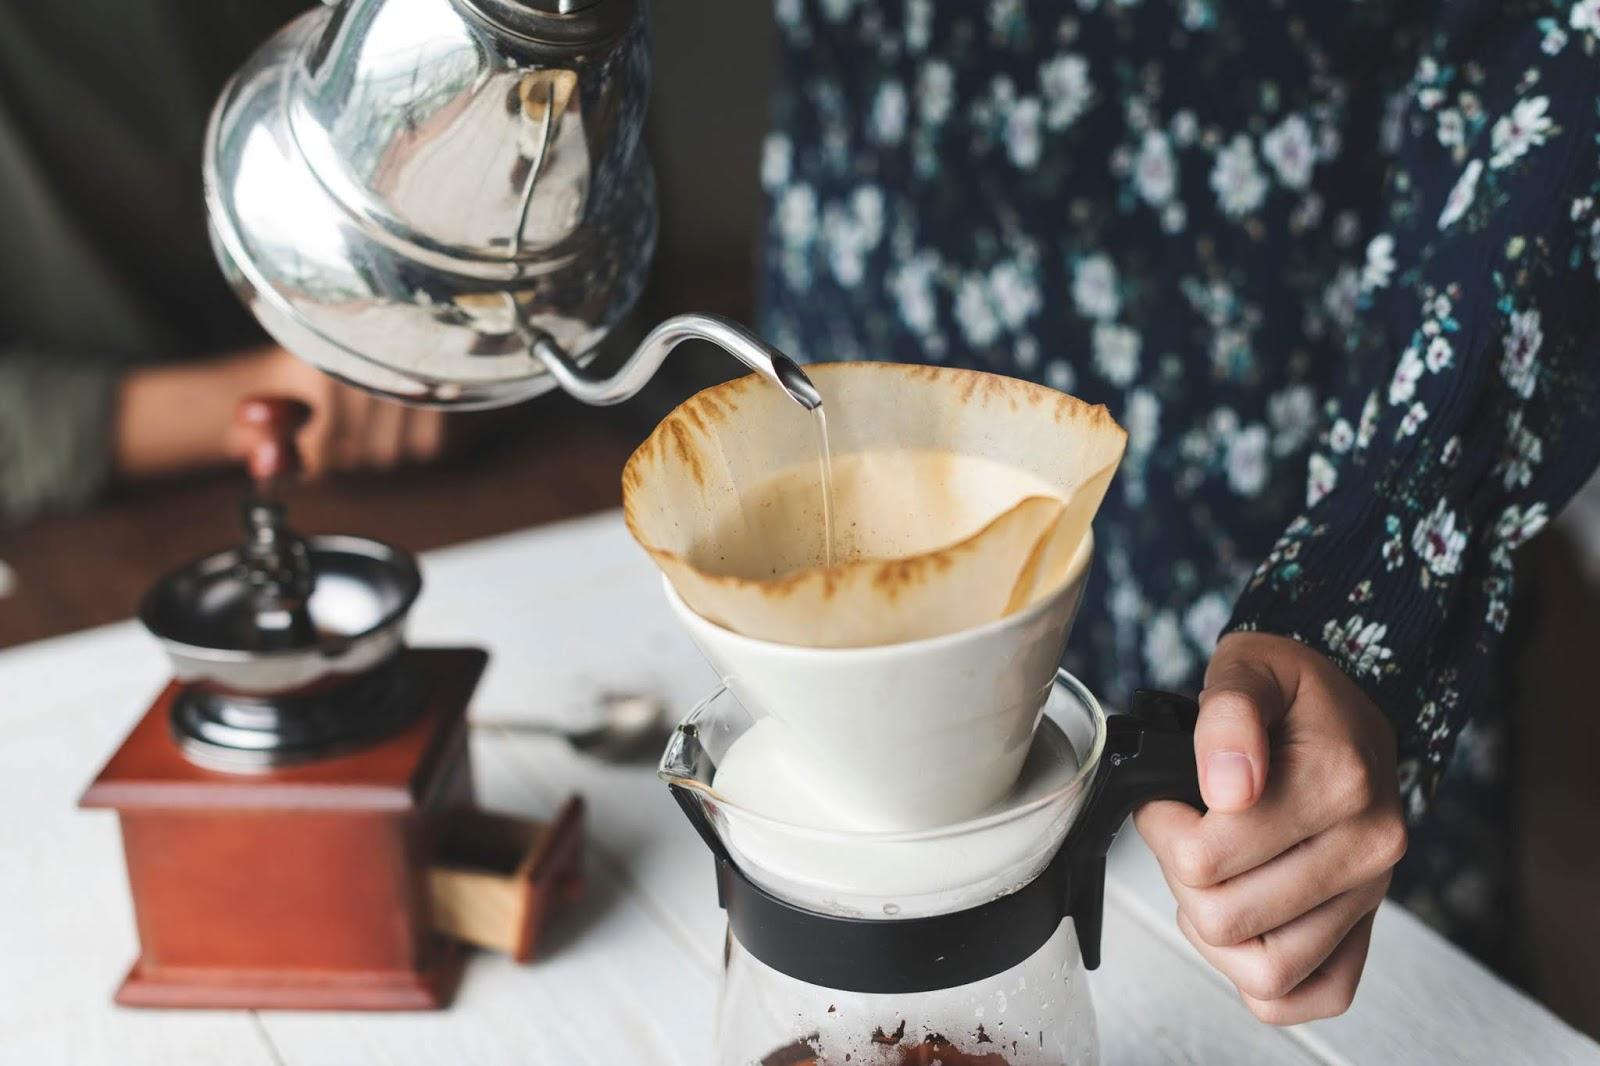 kawa z dripa jak zrobić